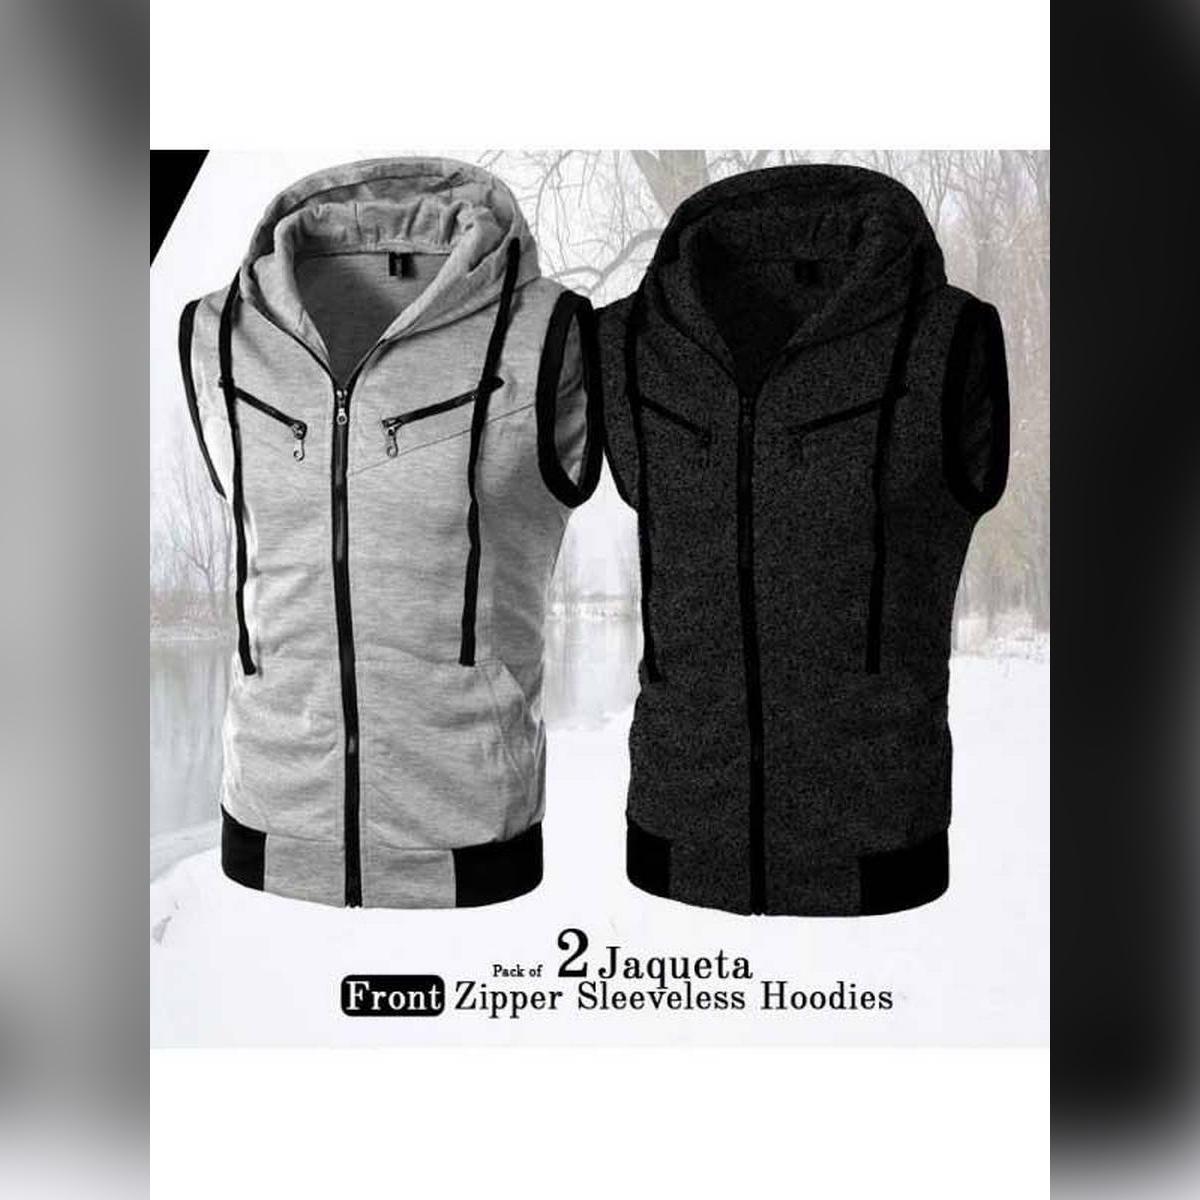 New fashion Pack Of 2  high quality Jaqueta Front Zipper Sleeveless Hoodies Top T-Shirt Sweat_er Waistcoat jackets Gyms Fitness Hoodie both men and women(Winter deal)